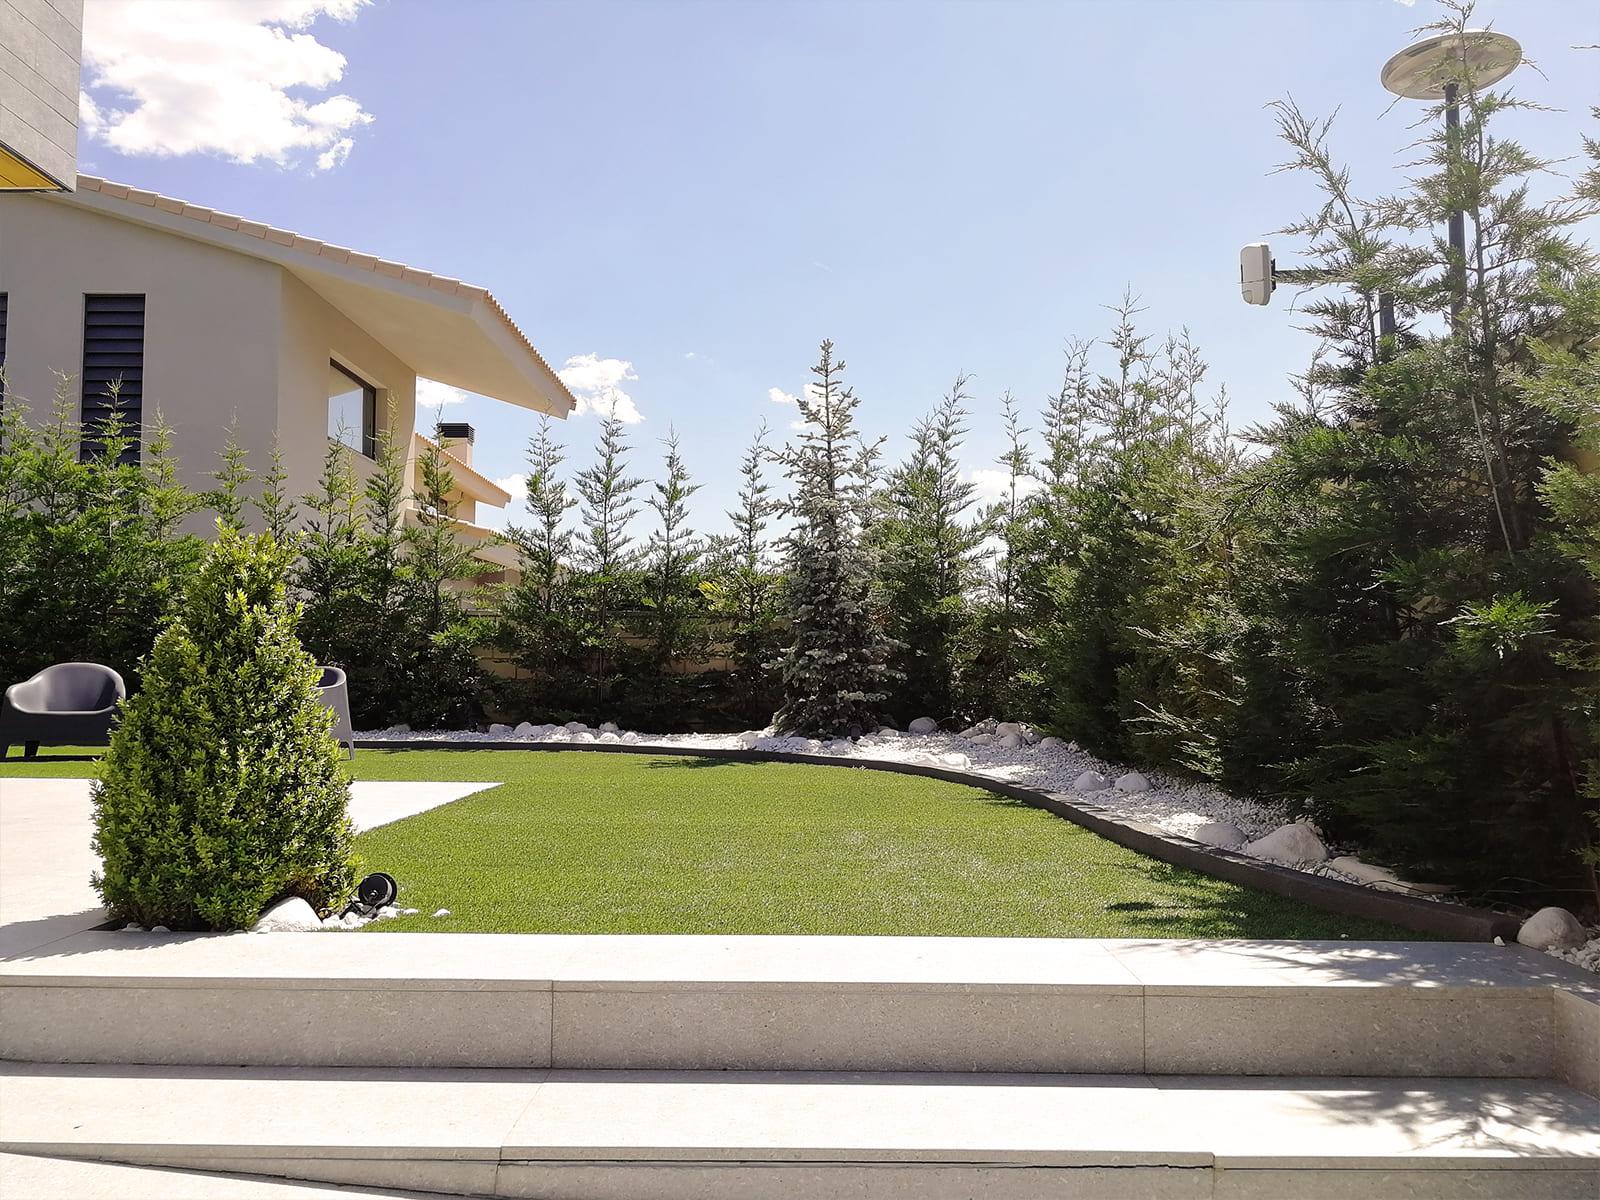 diseño-jardines-hamaca-olivo-JP-04_HIDROJARDIN-Bañeres